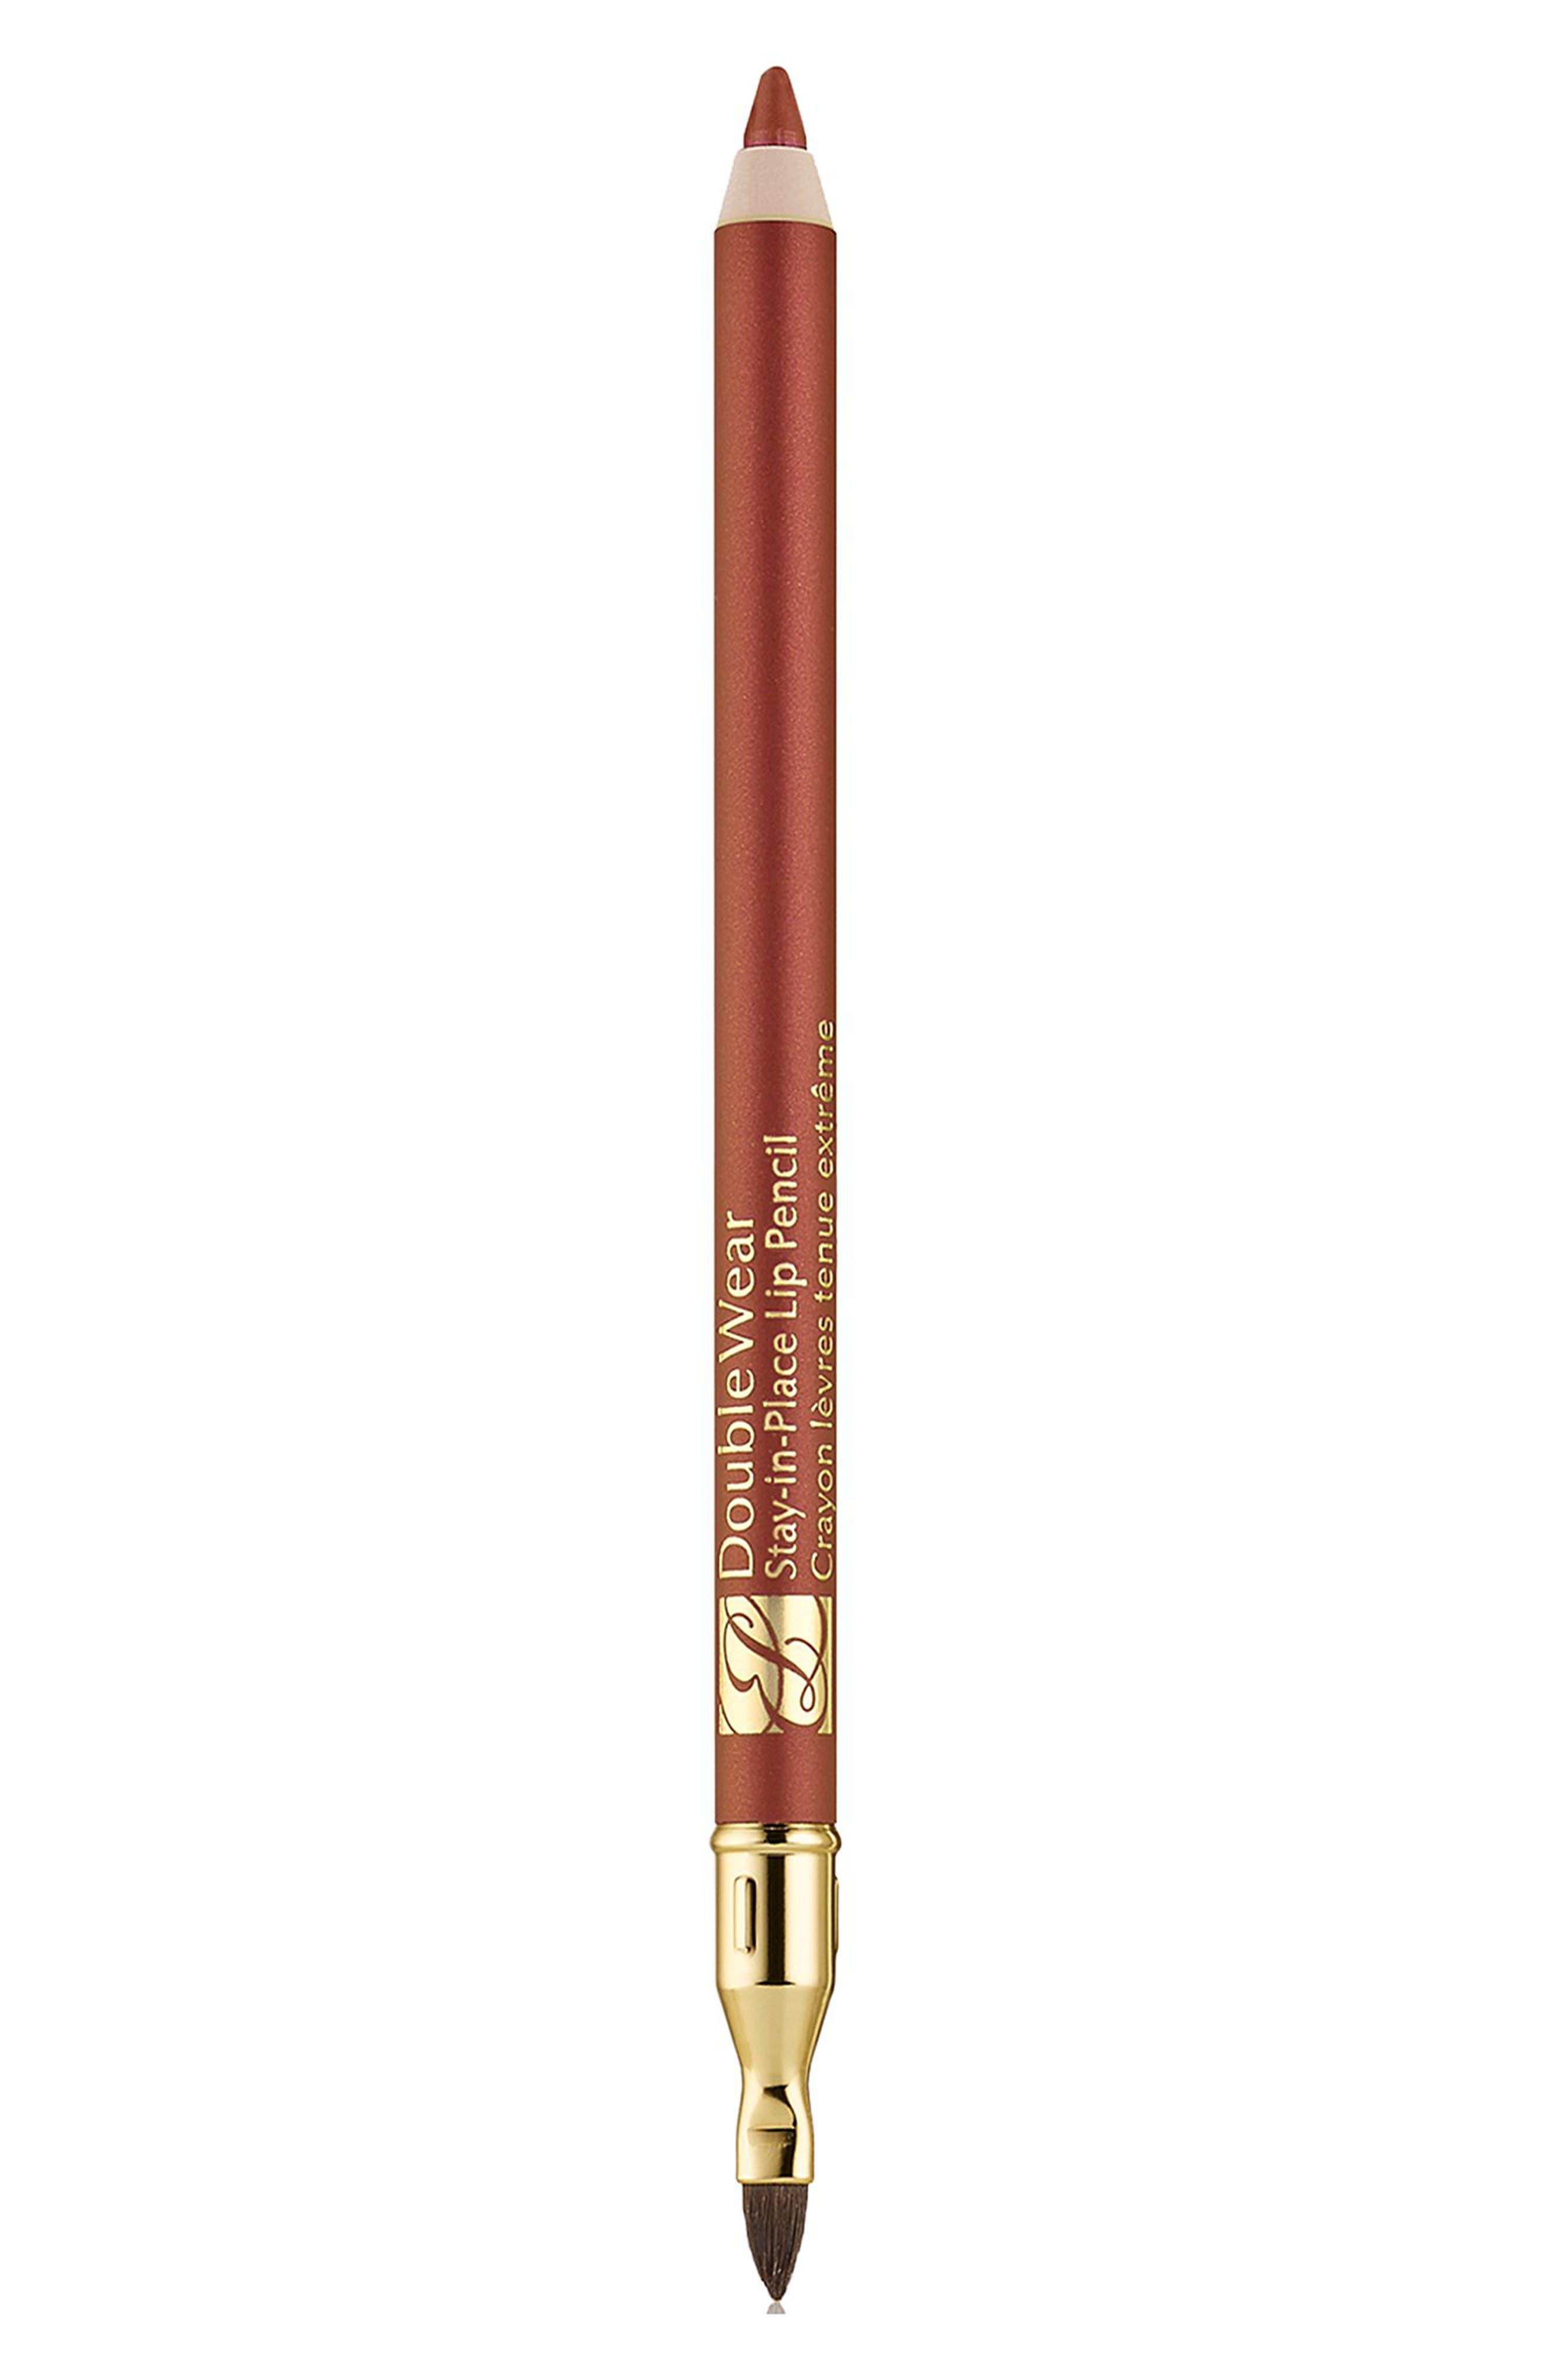 Estee Lauder Double Wear Stay-In-Place Lip Pencil - Spice